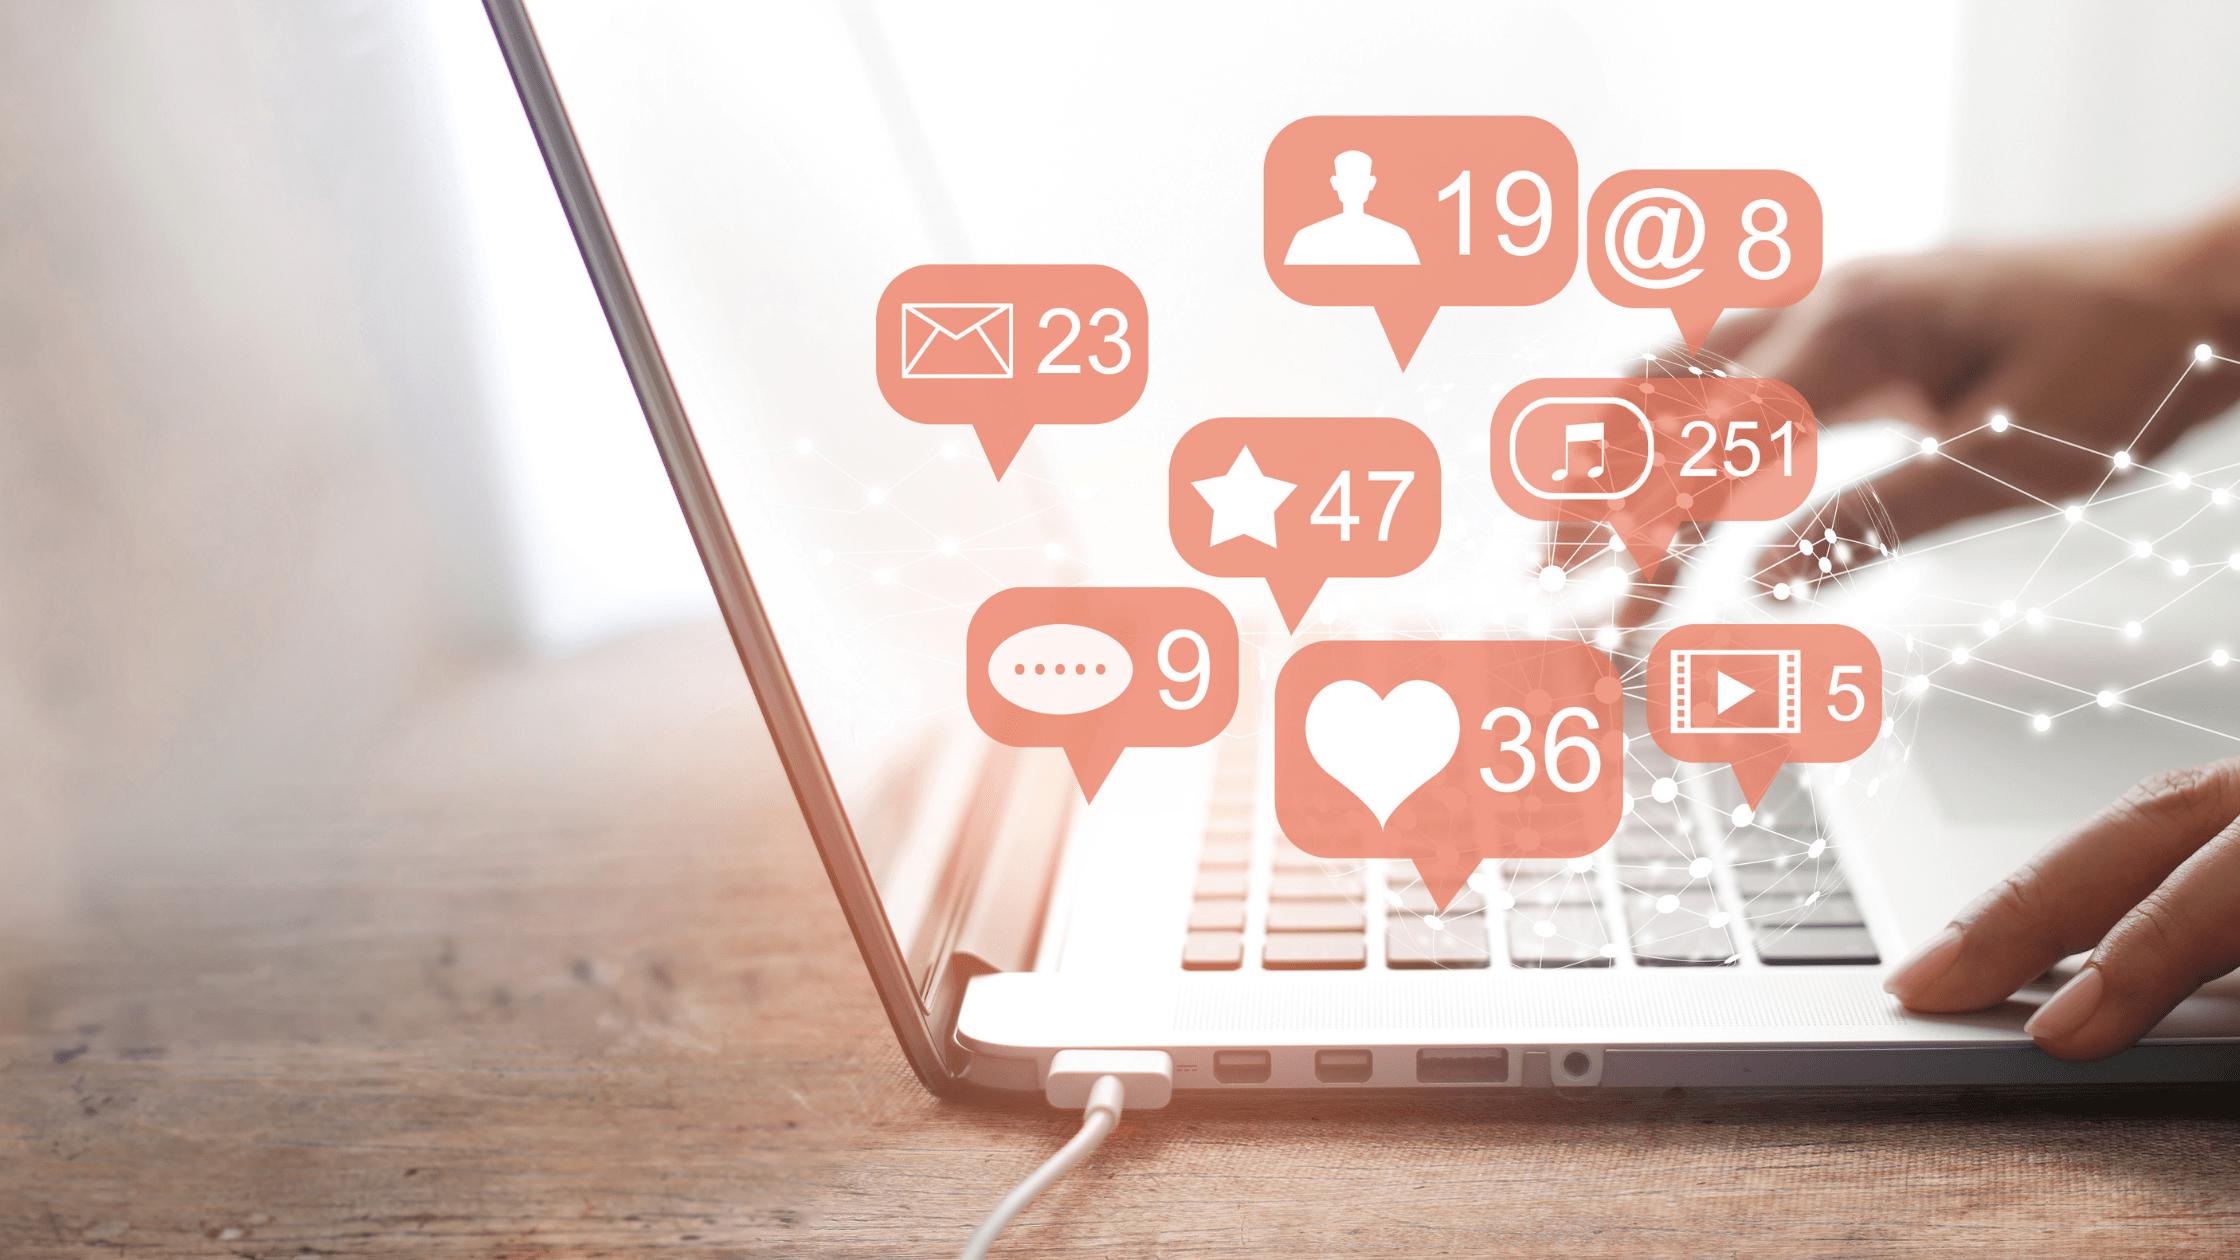 4. Adjust Messaging and Communication